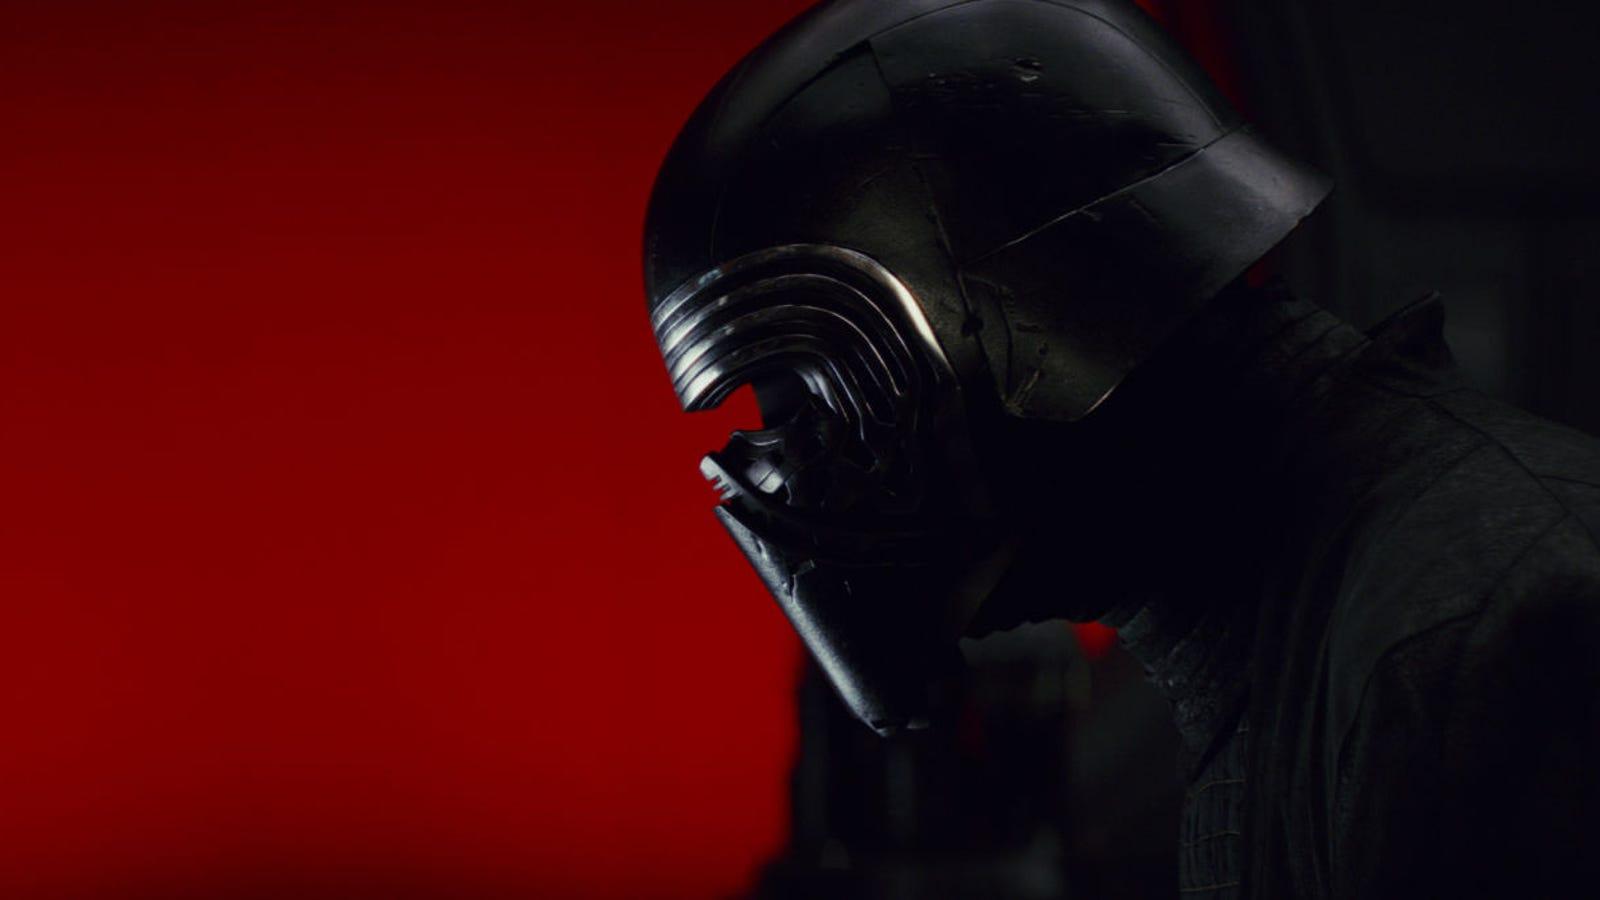 The Last Jedi spoiler paranoia is everywhere